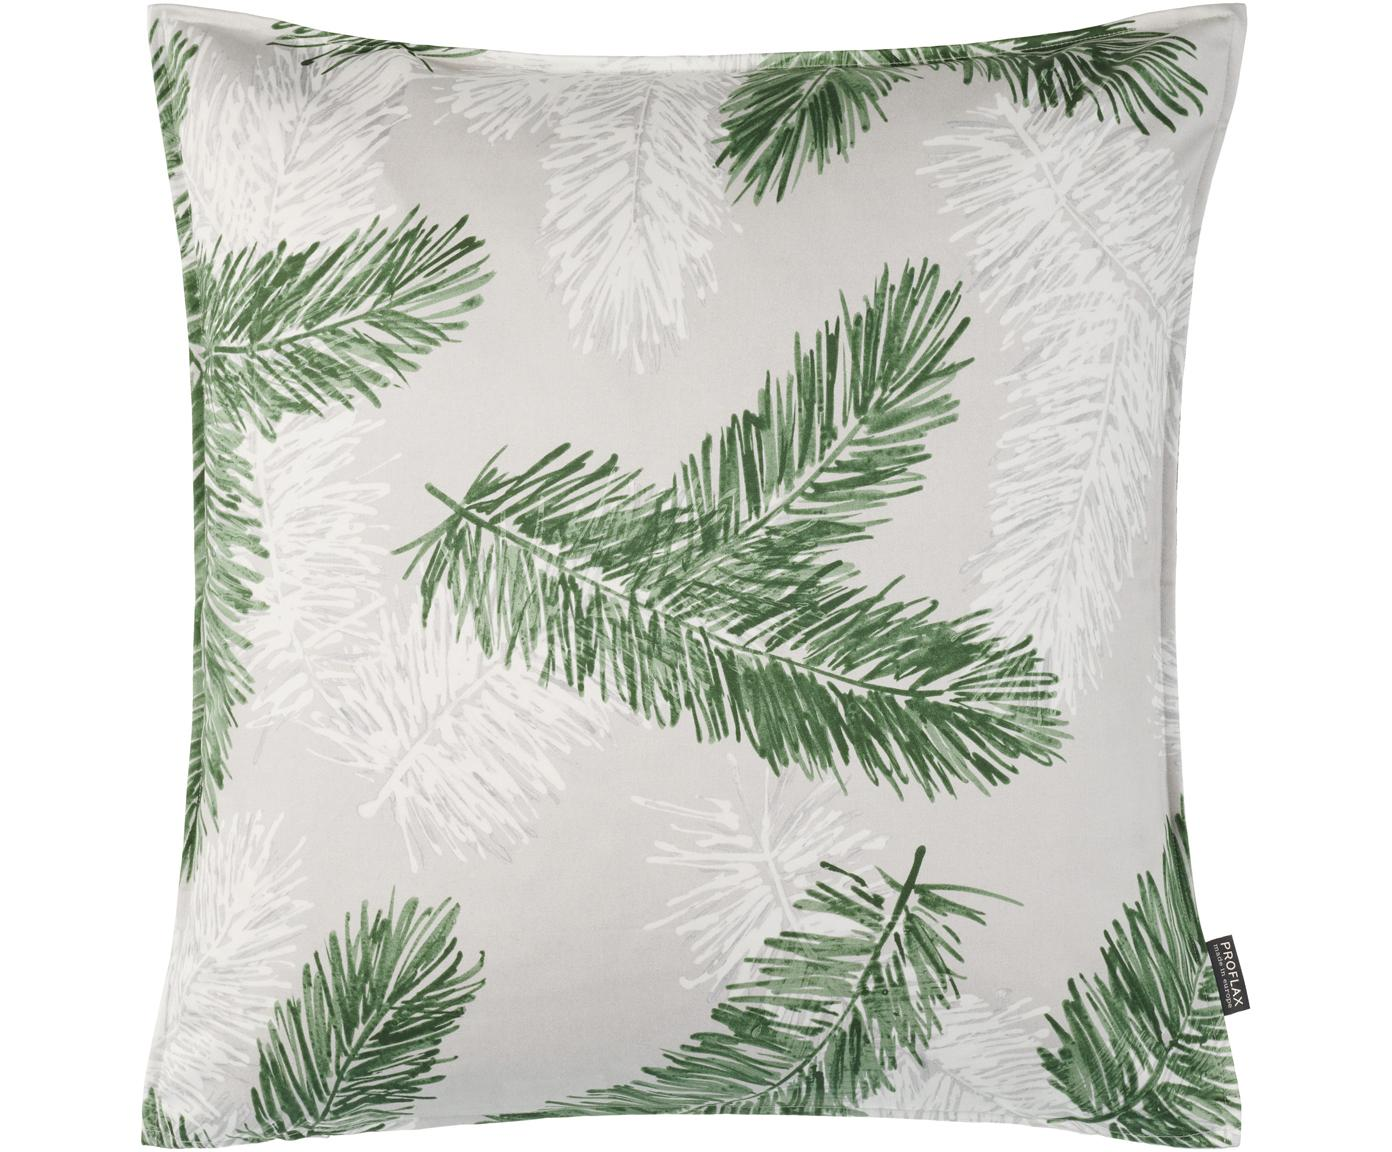 Federa arredo Pinus, Cotone, Grigio, verde, Larg. 40 x Lung. 40 cm